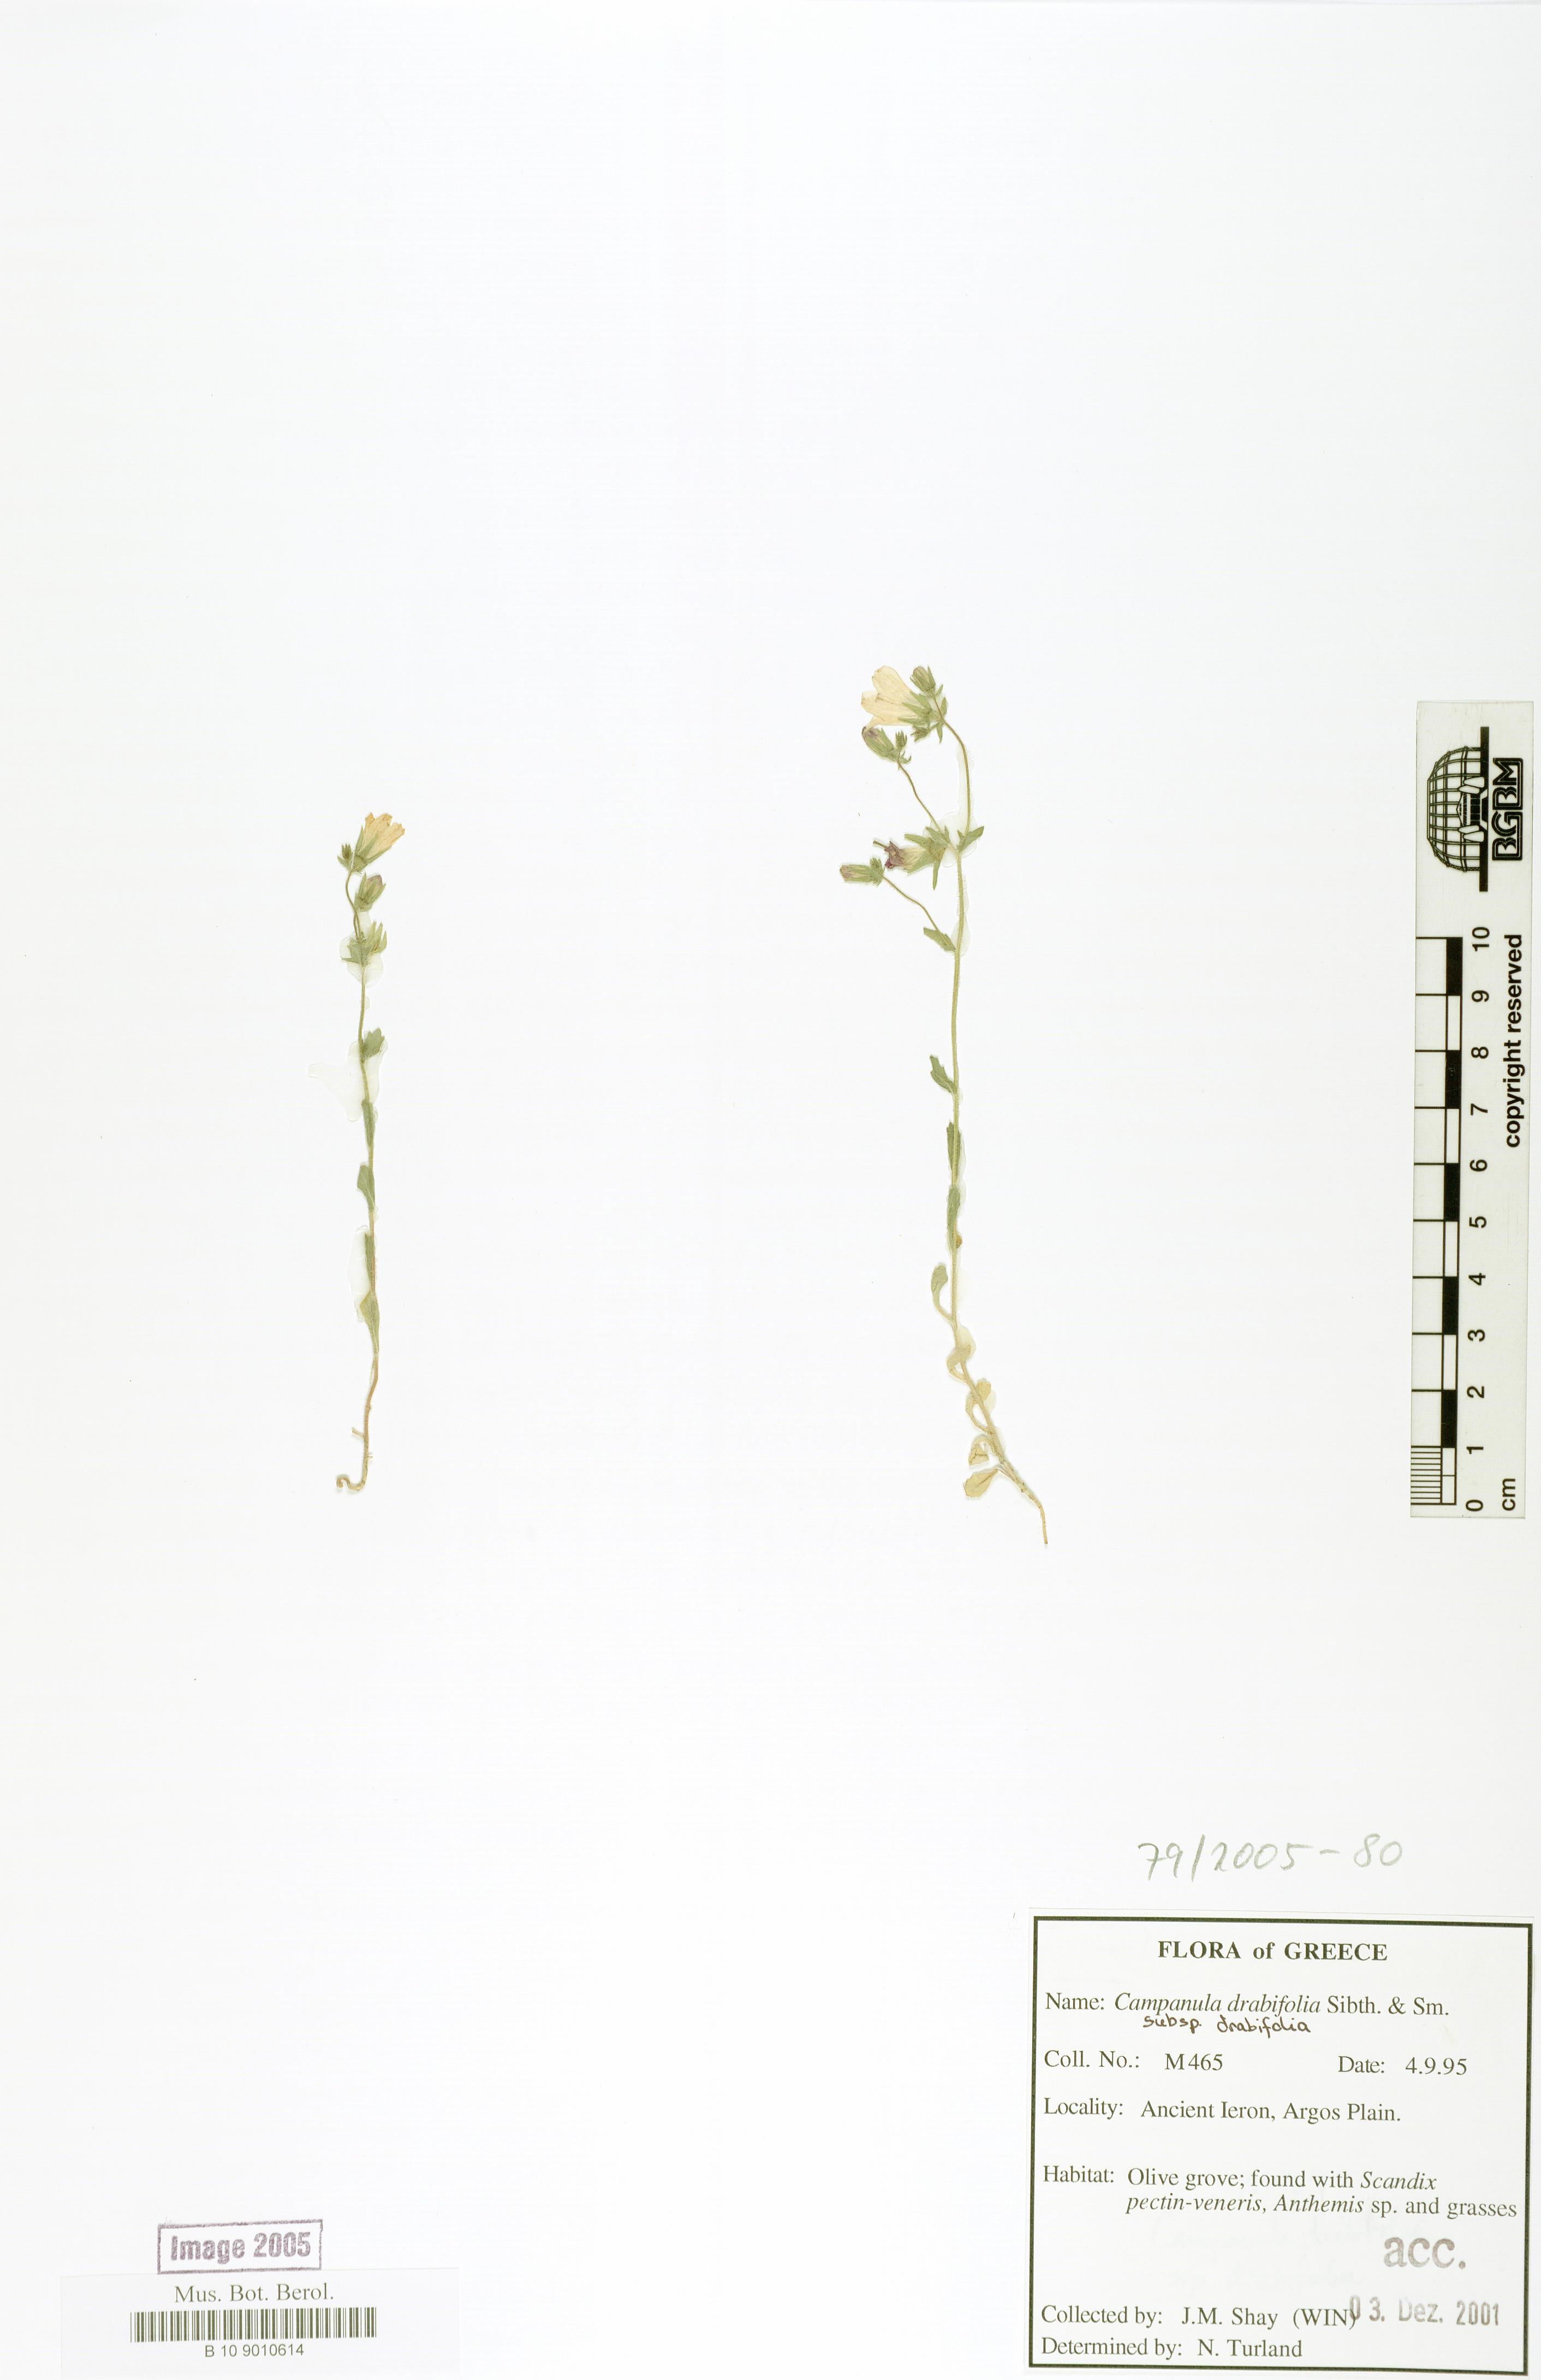 http://ww2.bgbm.org/herbarium/images/B/10/90/10/61/B_10_9010614.jpg